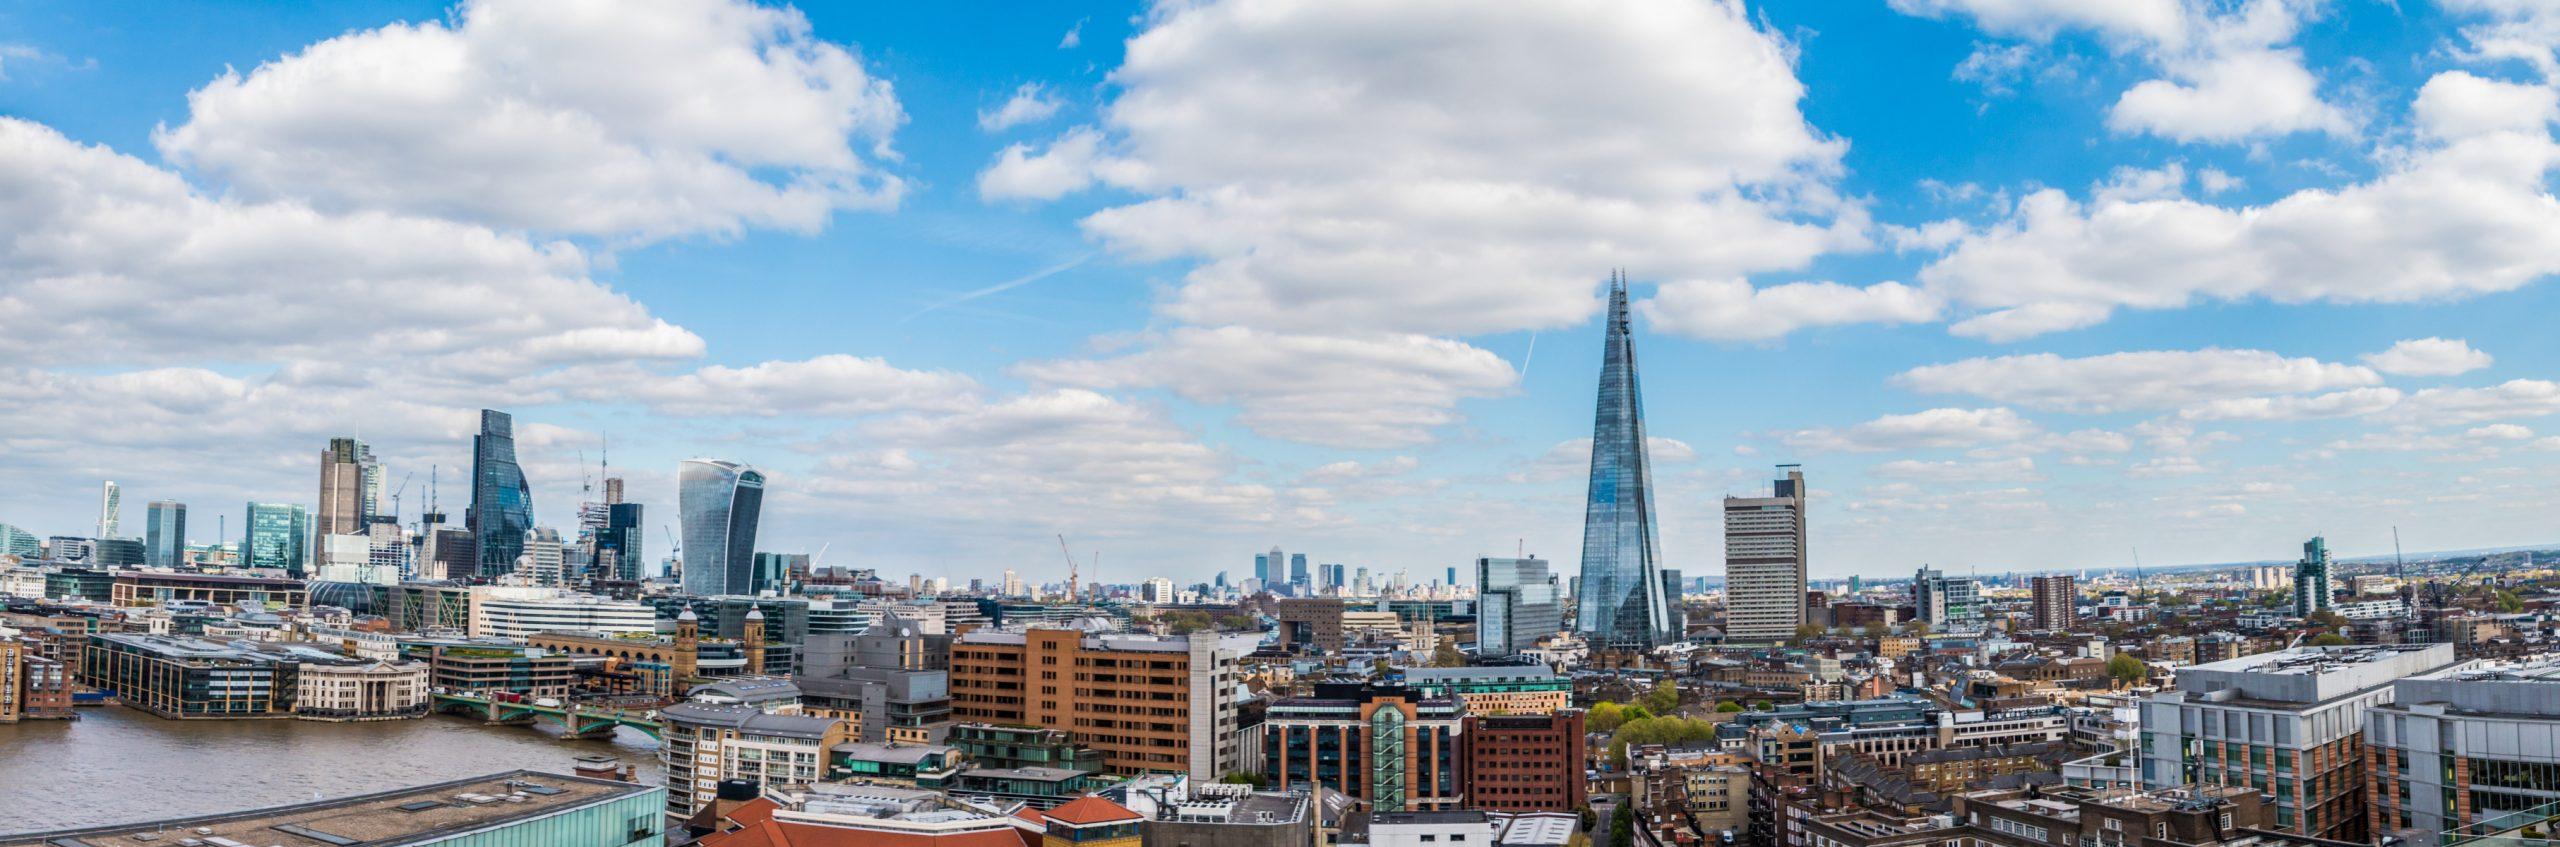 London Skyline daylight. Photos by TeeFarm from Pixabay